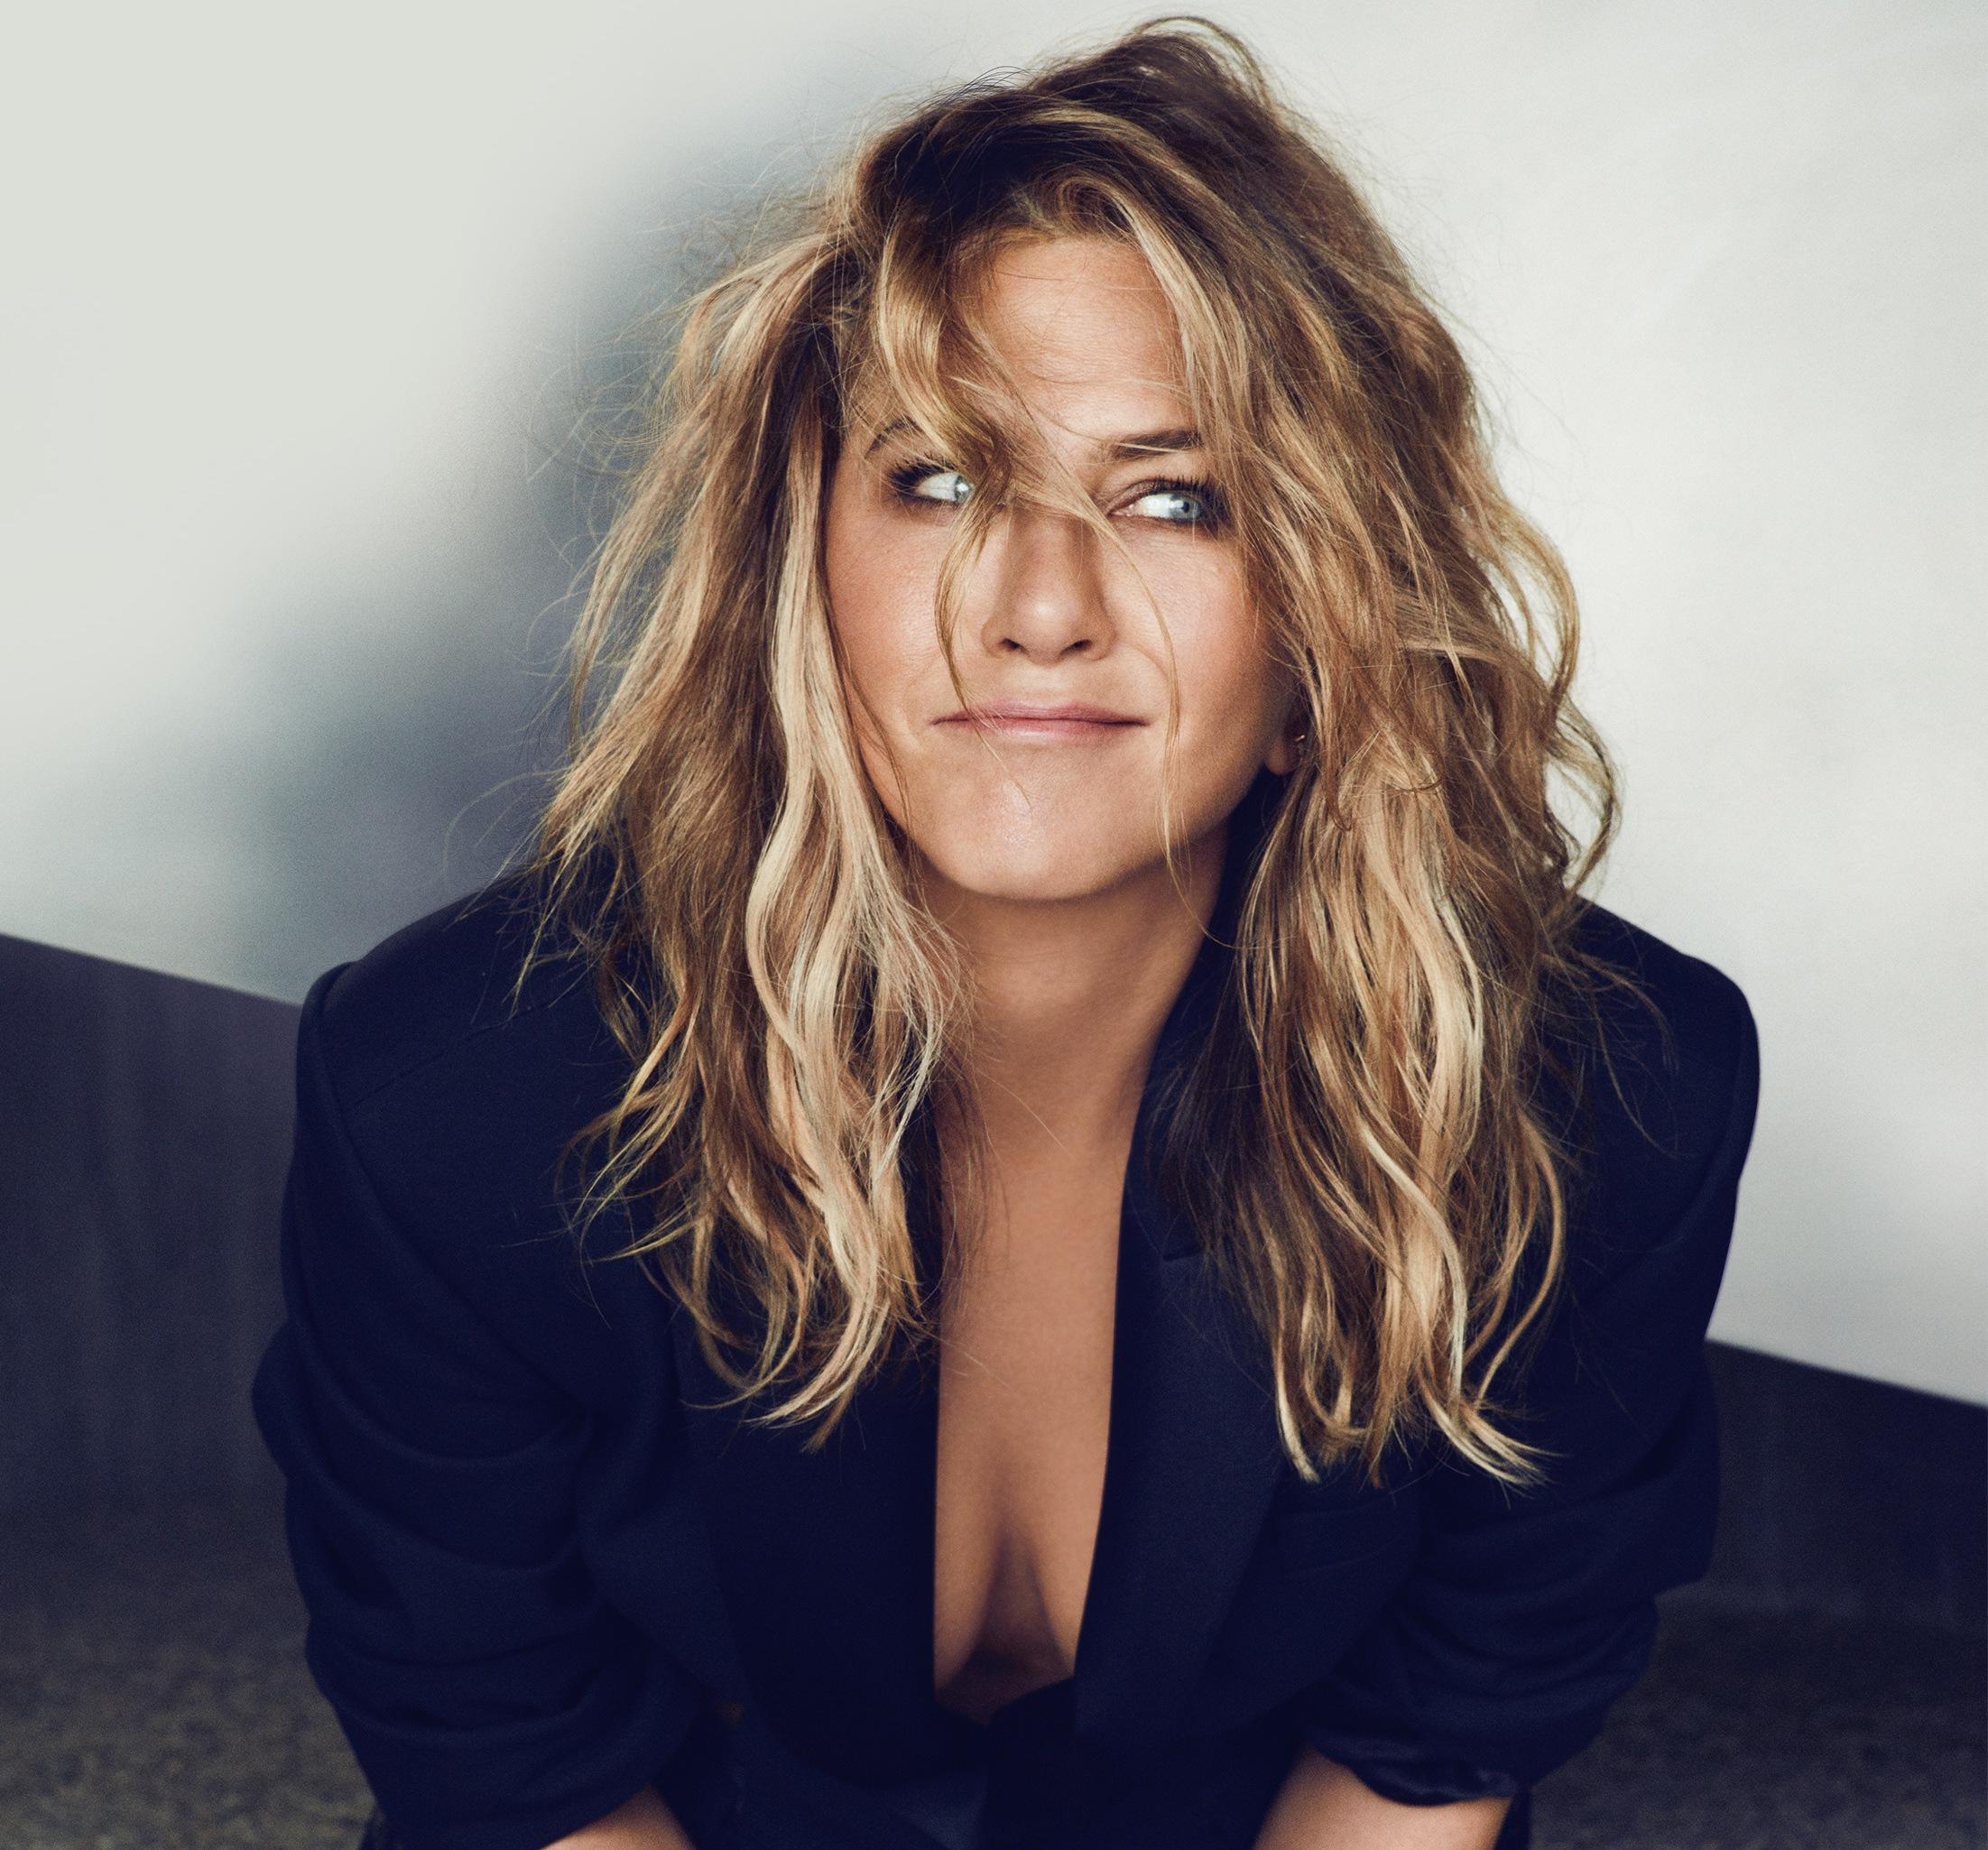 5 JEN 20 Things You Never Knew About Jennifer Aniston